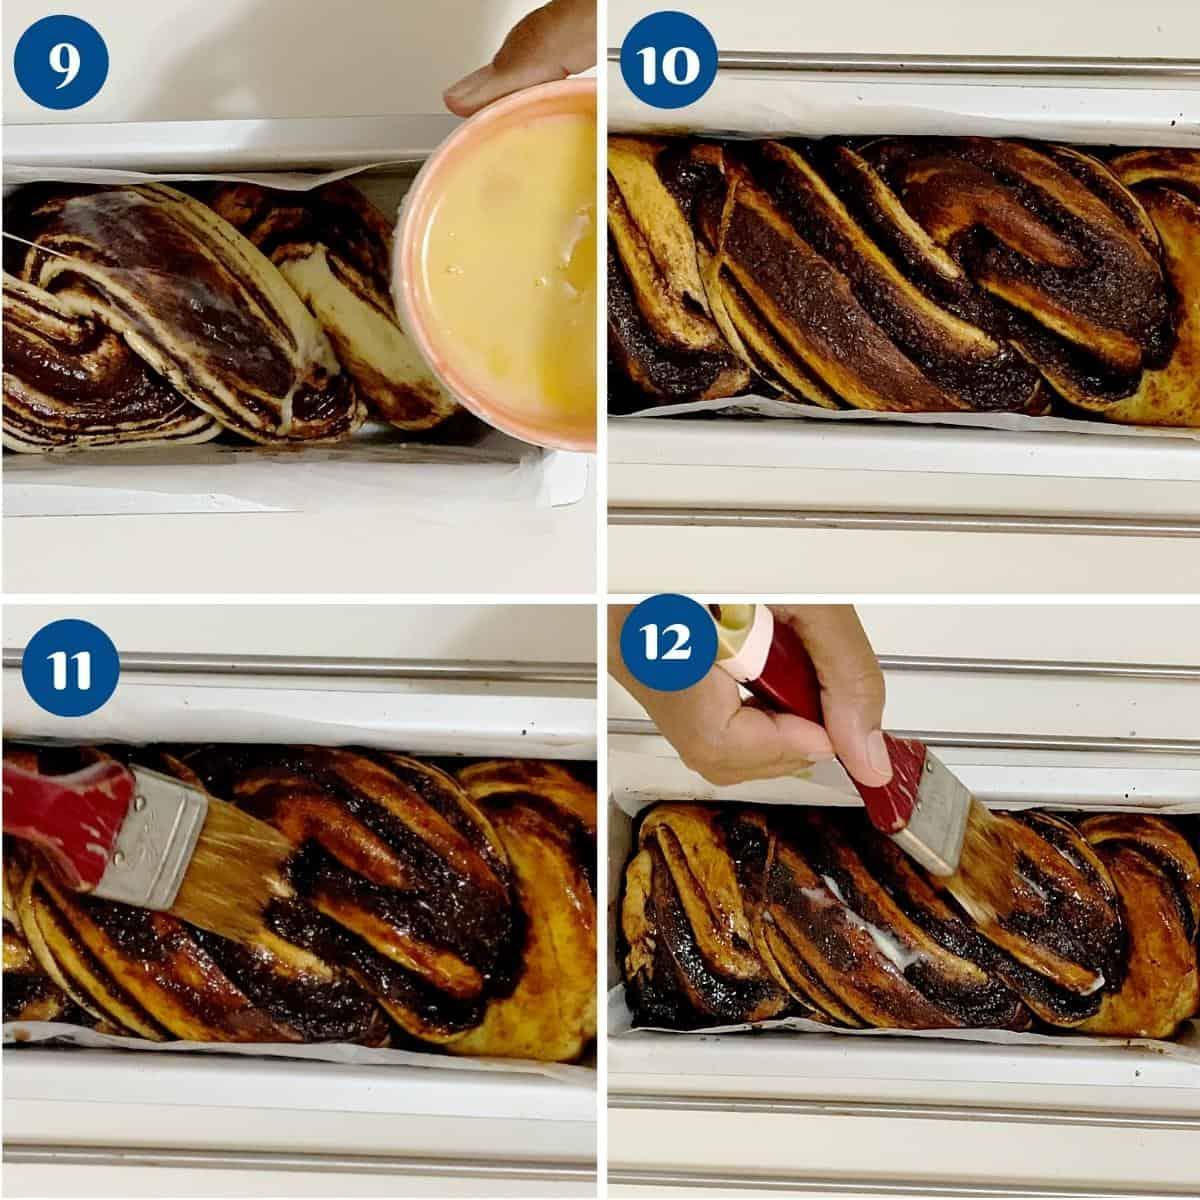 Progress pictures baking the chocolate babka.